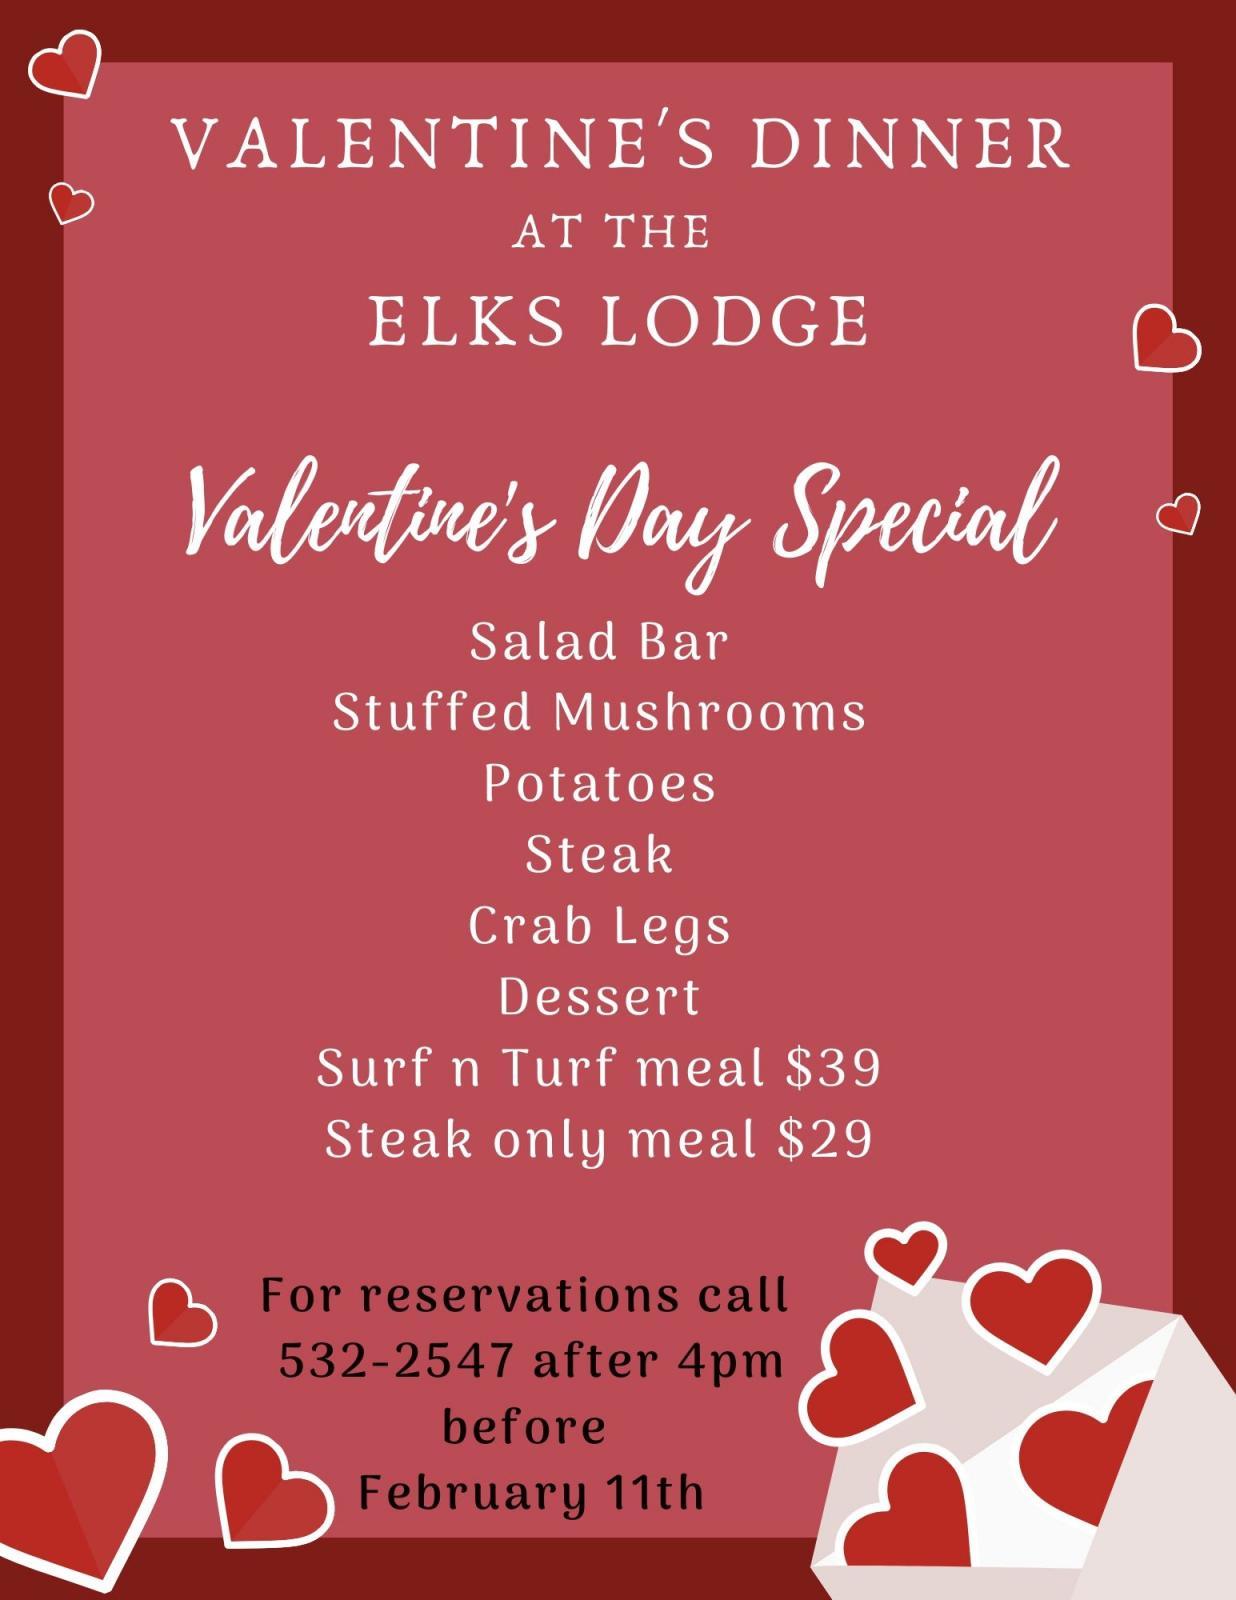 Valentine's Dinner at the Elks Lodge Photo